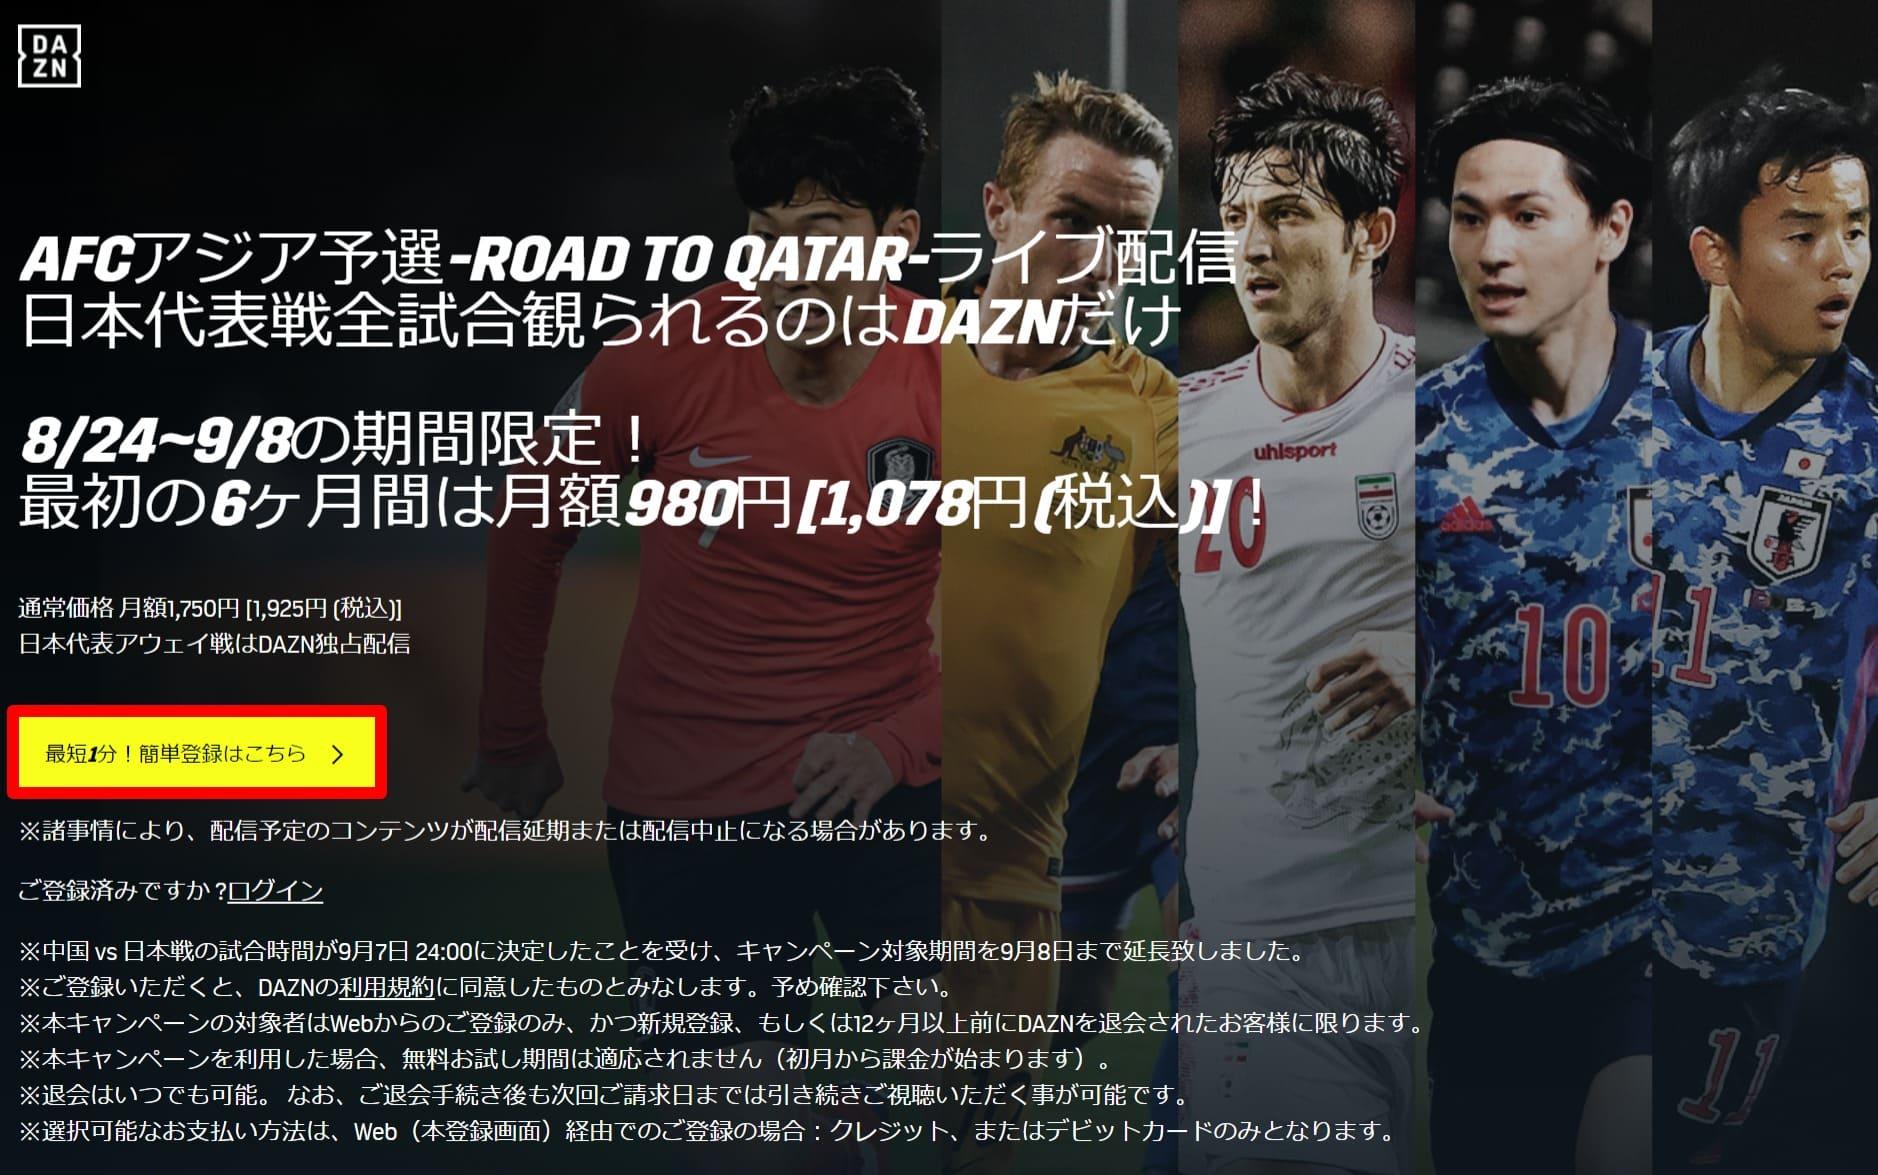 DAZN_カタールワールドカップアジア最終予選_全試合配信_キャンペーン